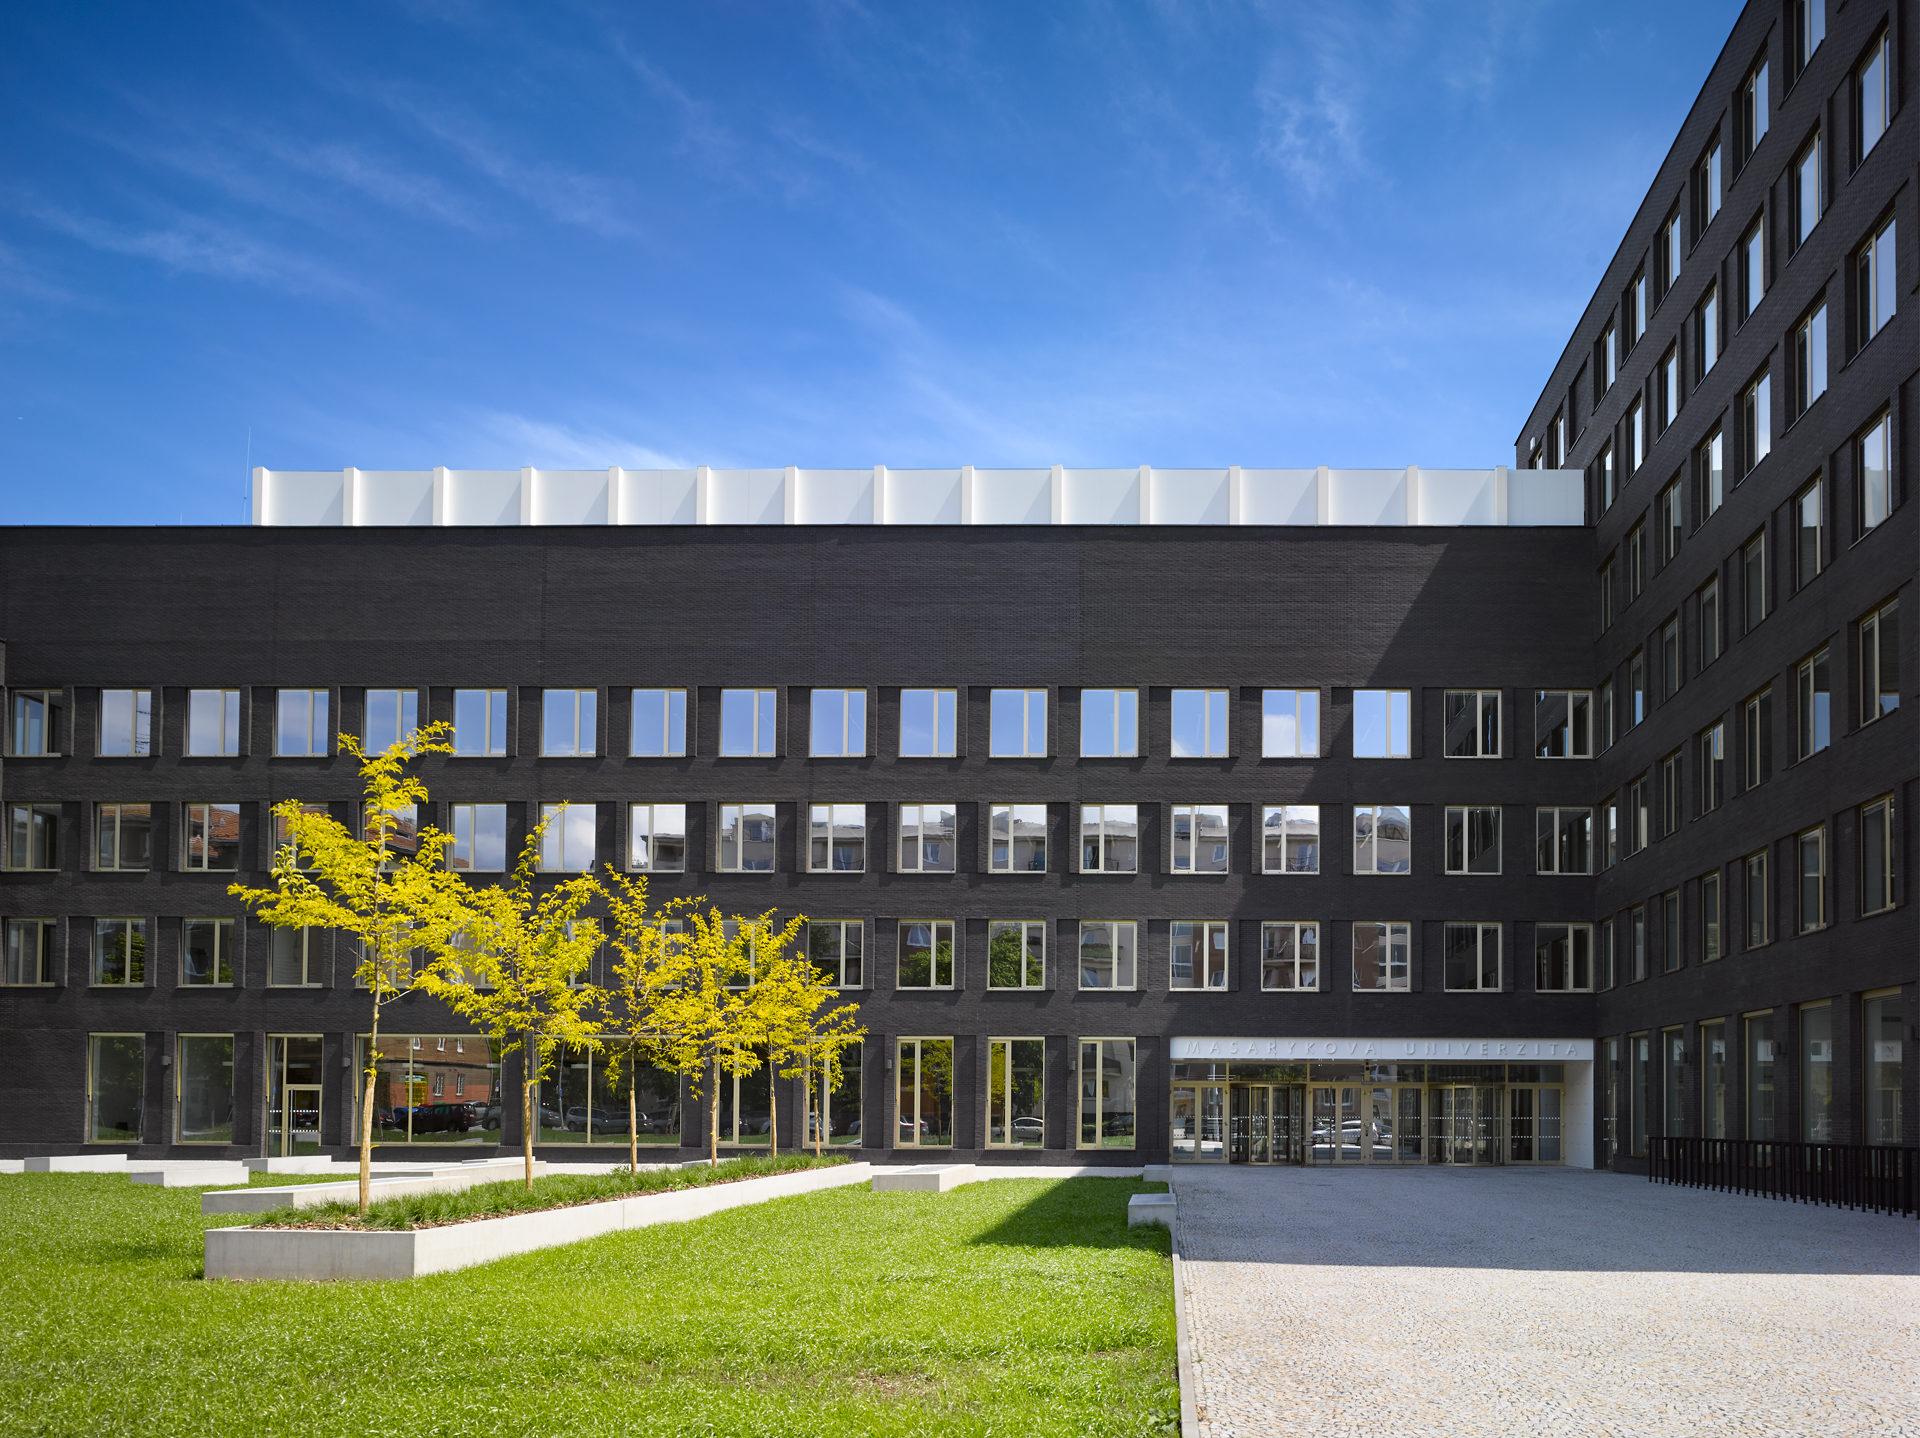 Faculty of Informatics, Masaryk University, Brno